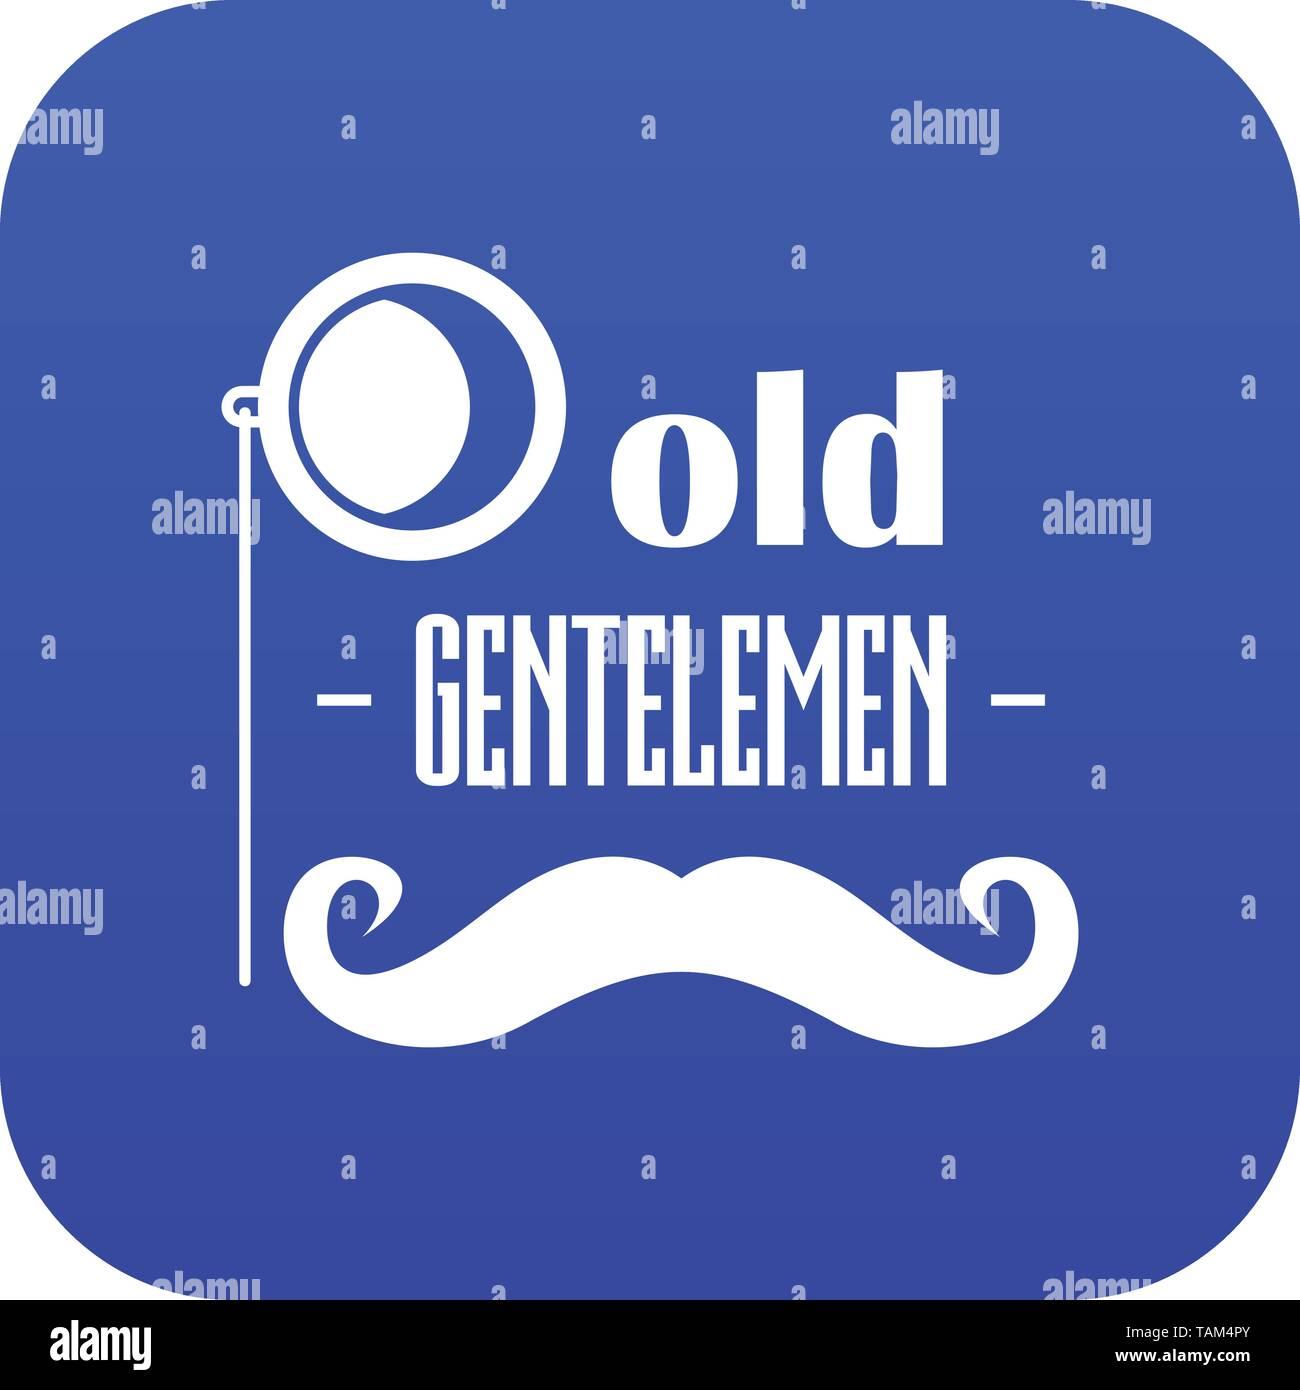 Old gentlemen icon blue vector - Stock Image